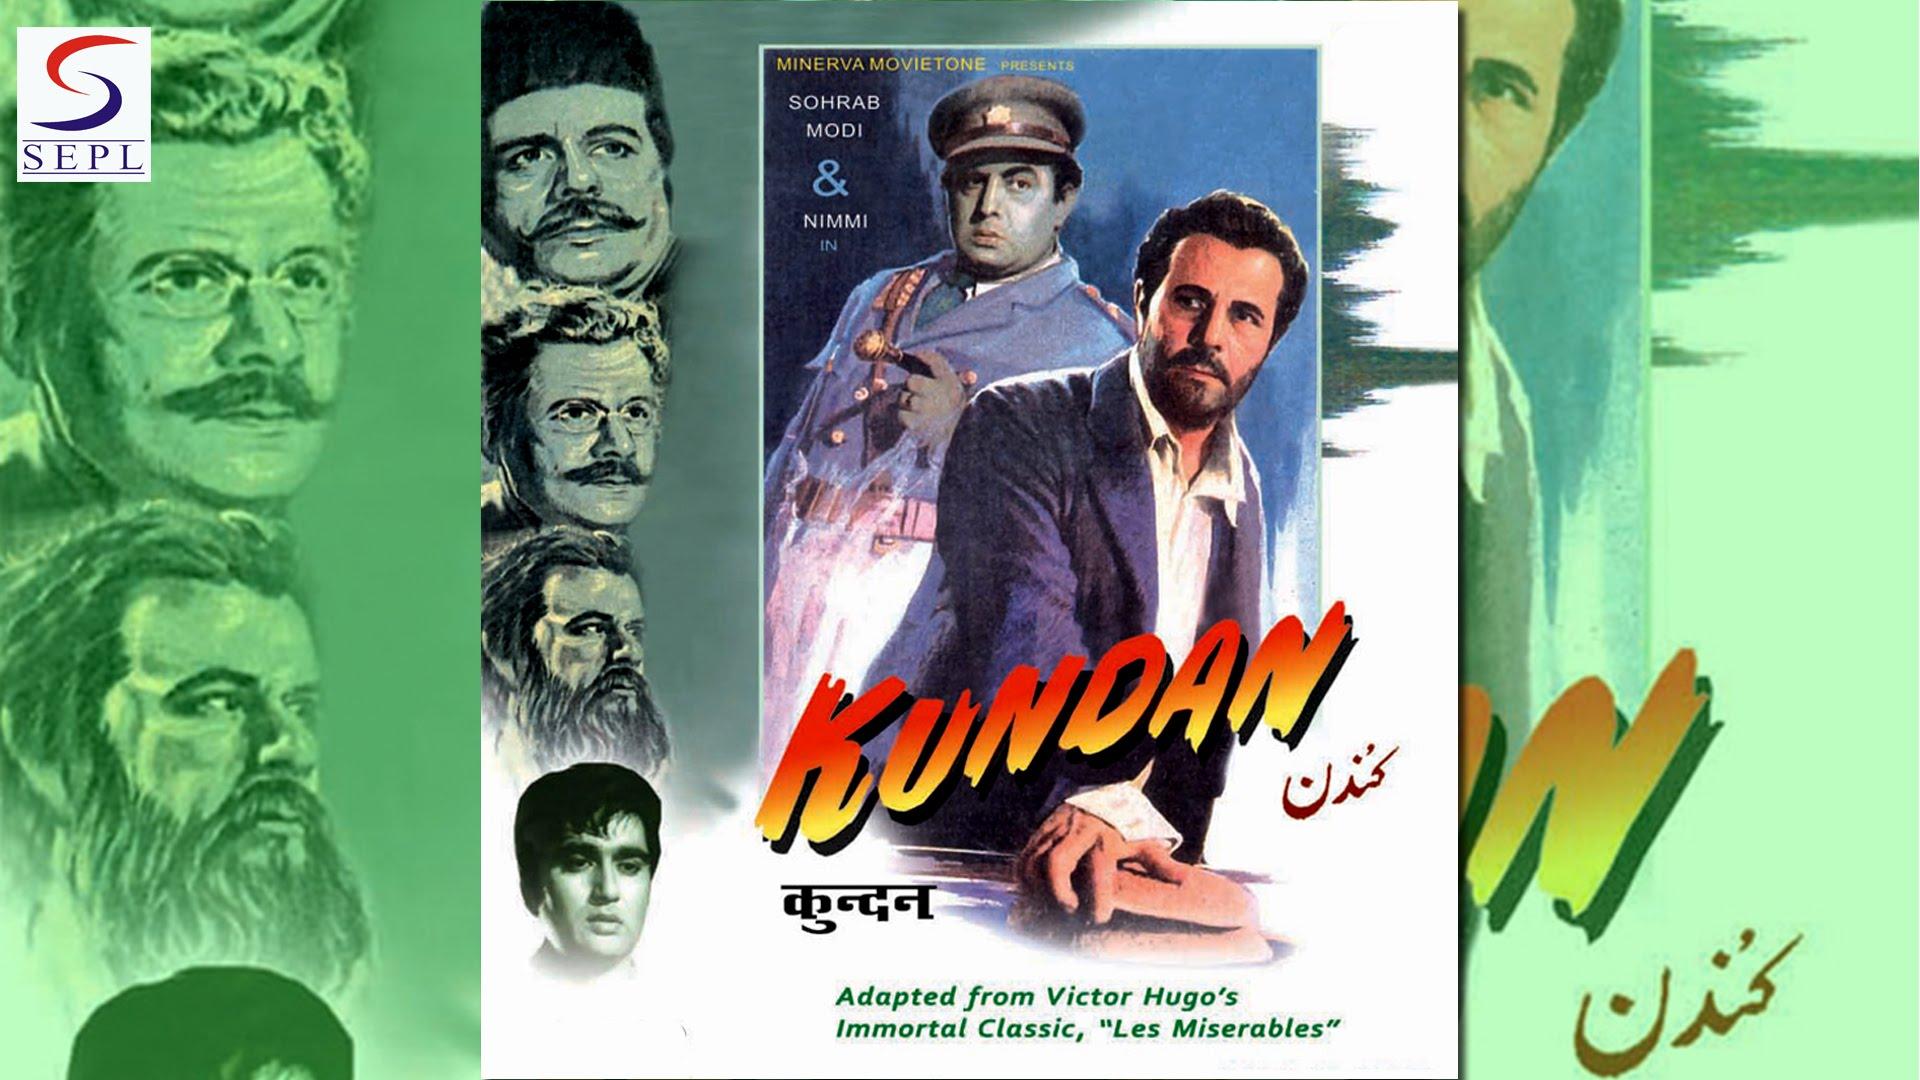 Shaheed Uddham Singh Full Hindi Movie Download ##BEST## Free In Hd 3gp Mp4 Kundan